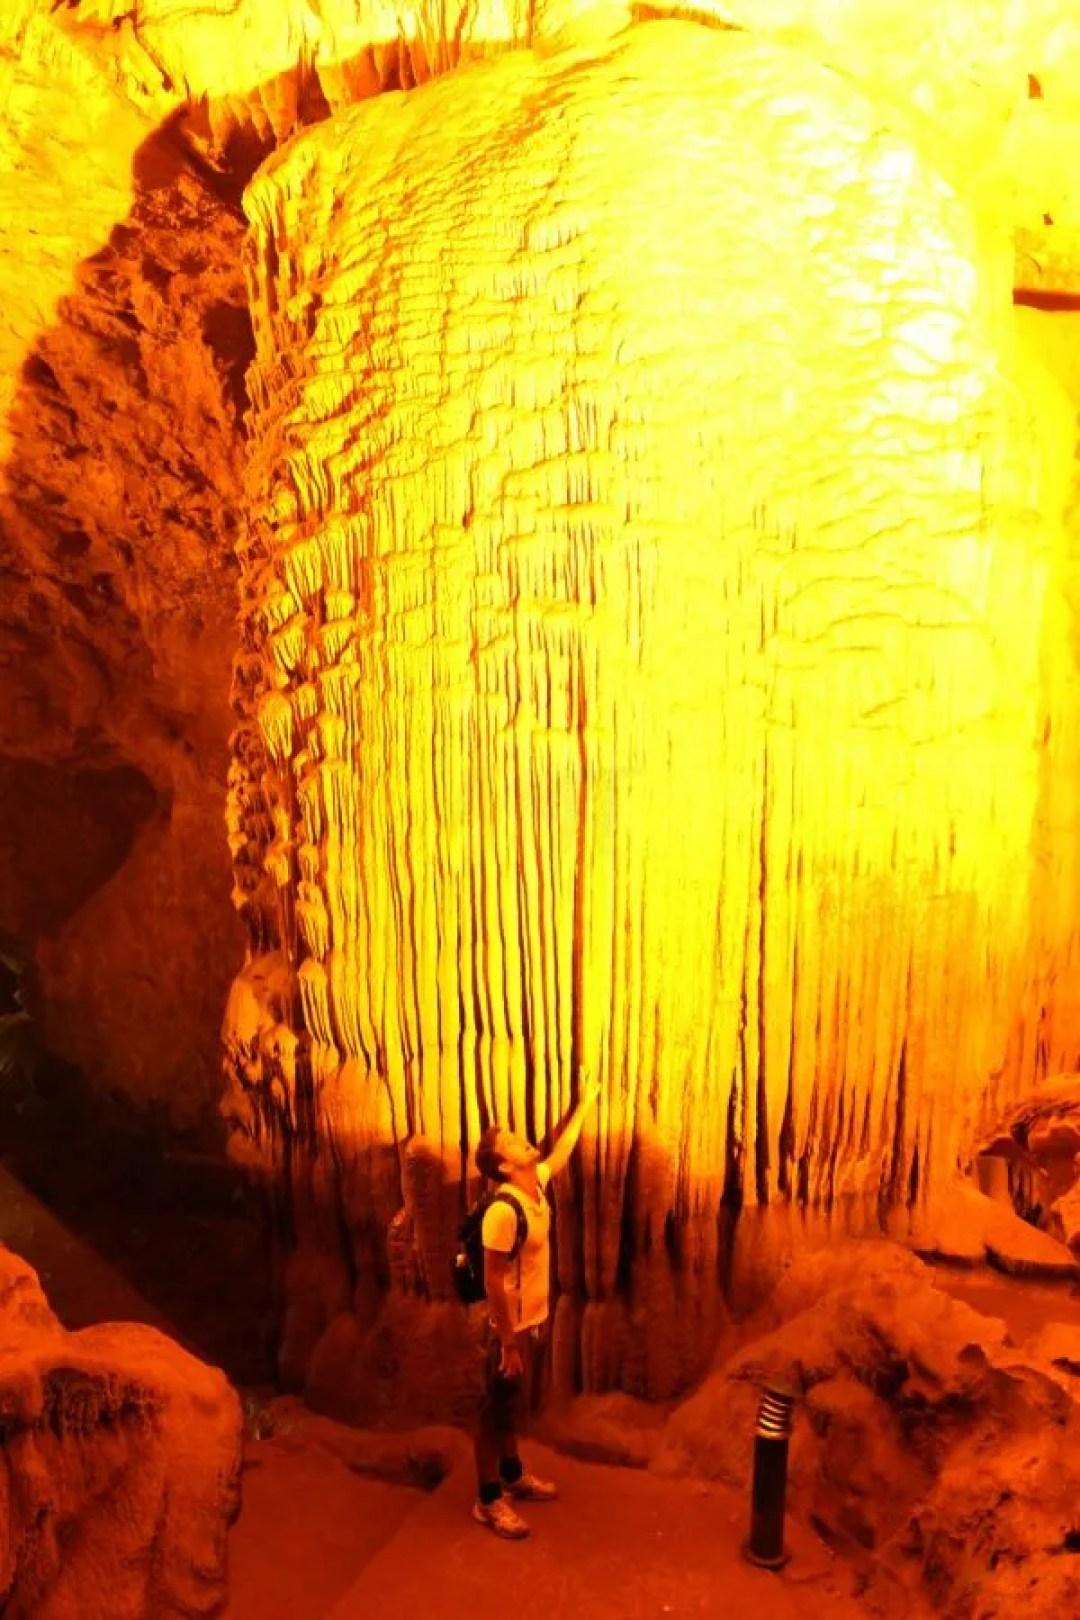 Huge stalactites